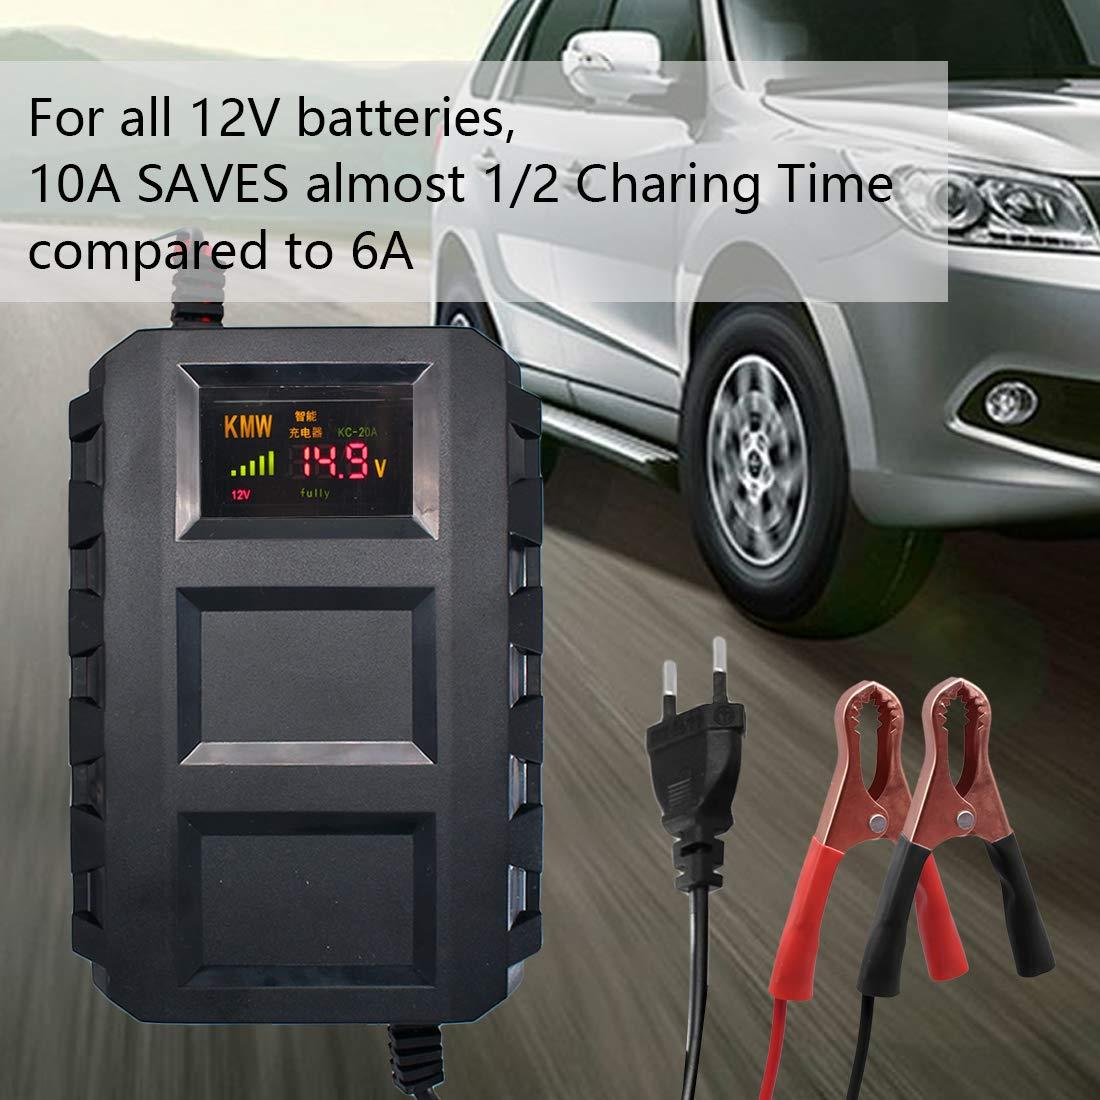 Autobatterieladeger/ät 12V Auto 1300mA Automatica Maintainer Mehrere Schutzfunktionen f/ür Auto,Moto,Kofferraum,Boot